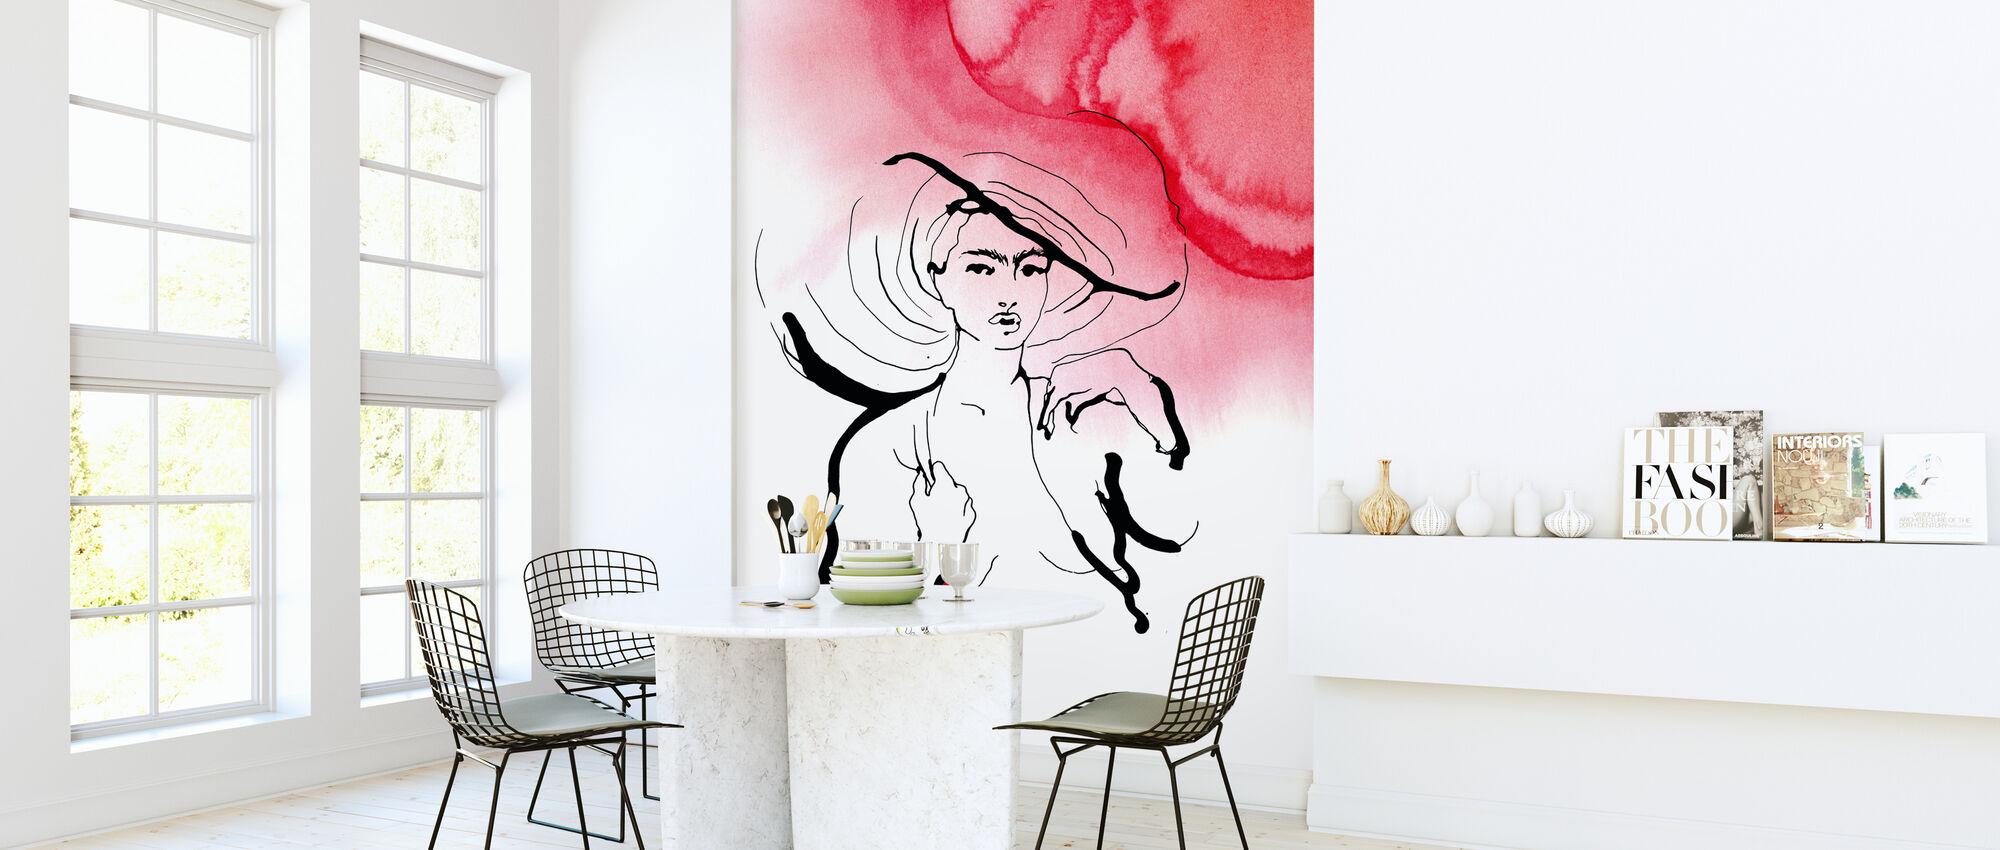 The Hat - Wallpaper - Kitchen